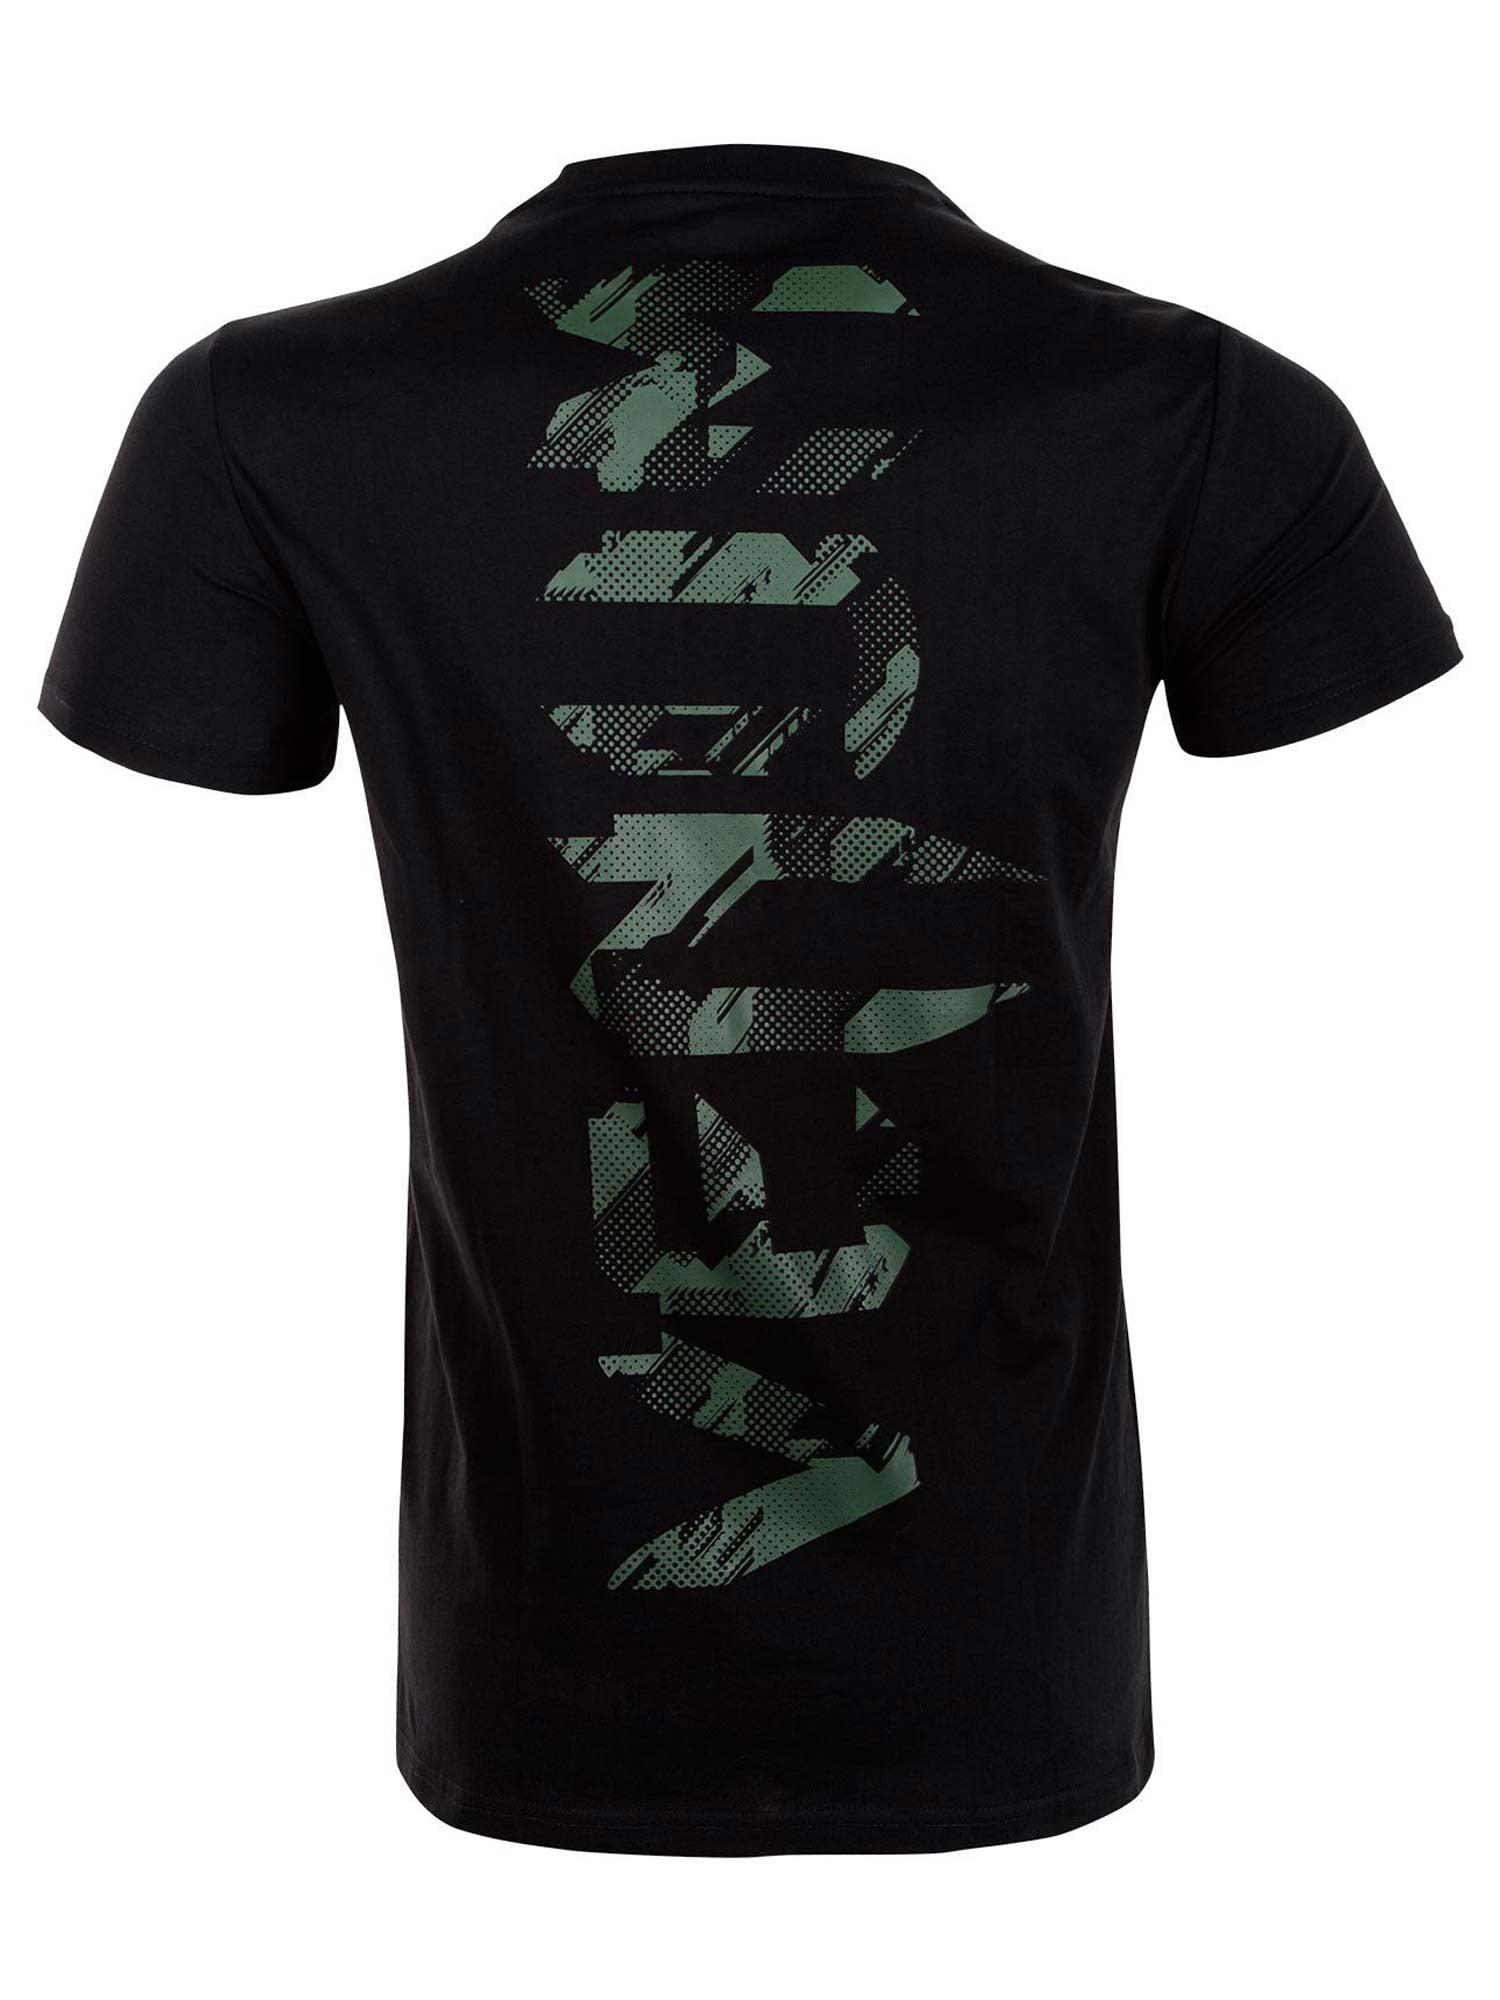 Black//Khaki Venum Tecmo Giant T-Shirt